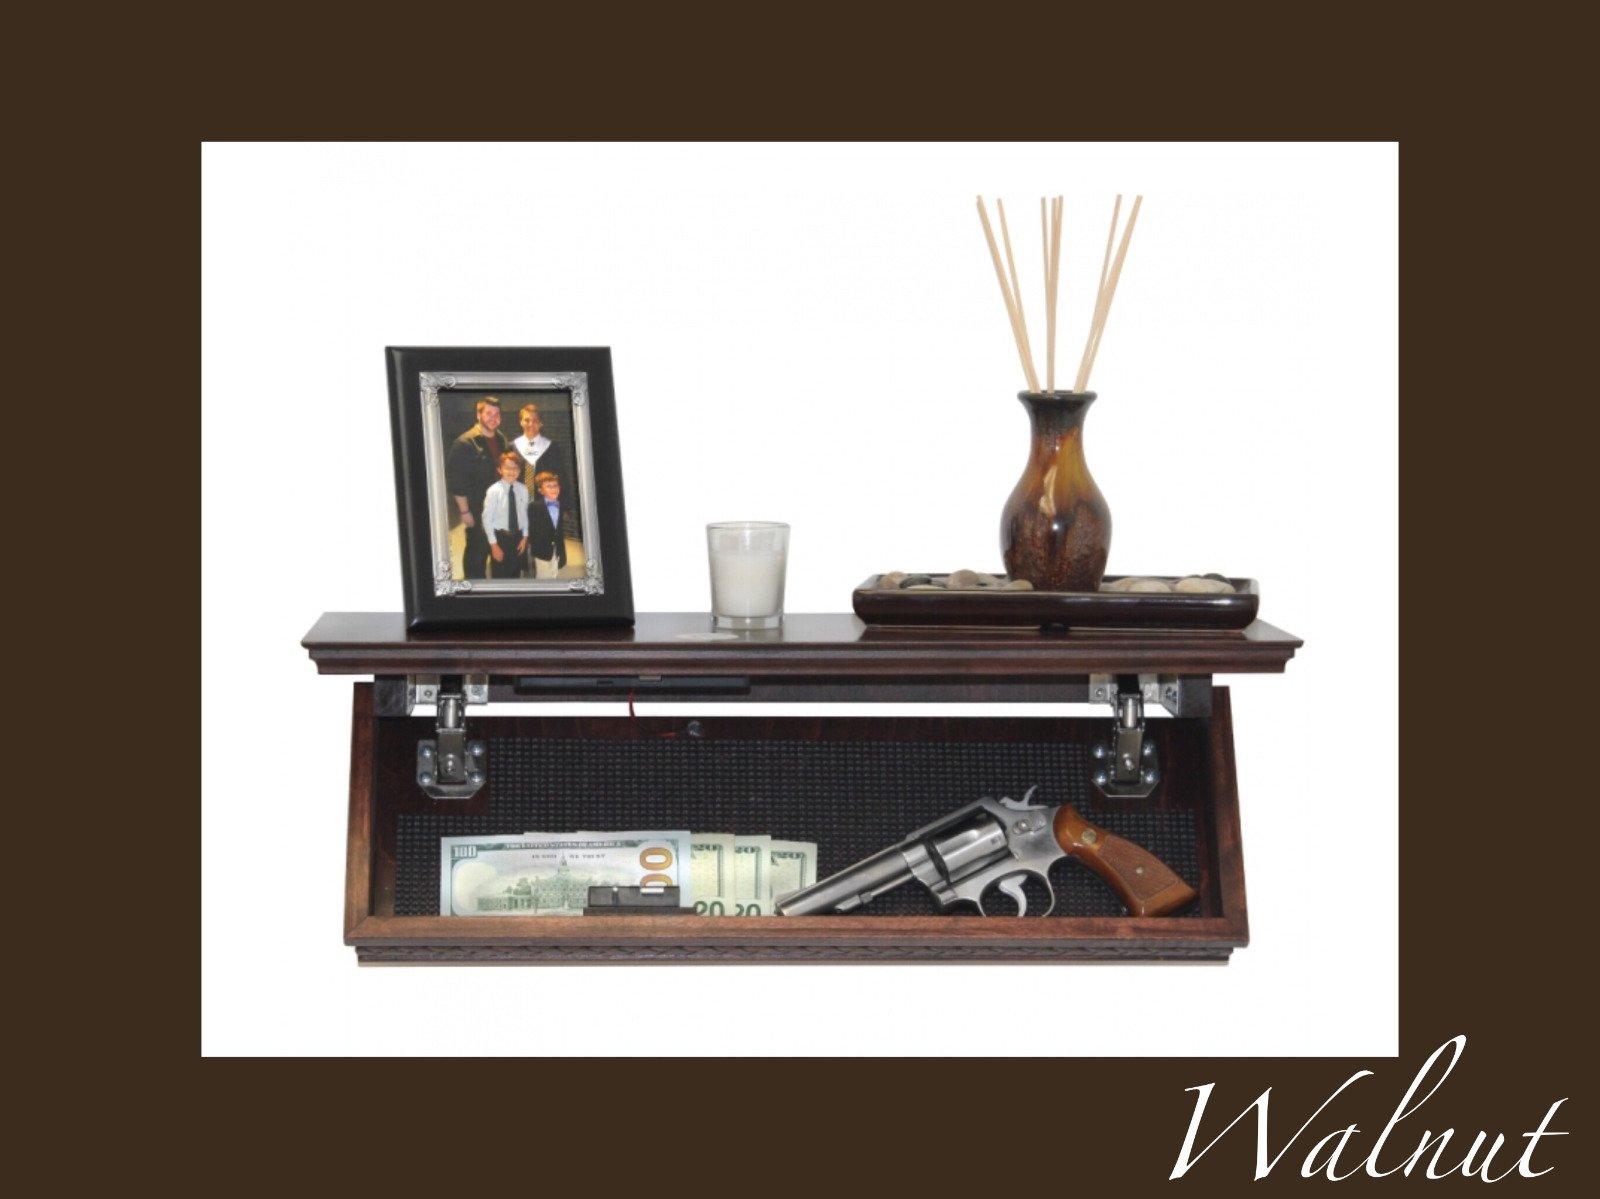 Quick Safes Walnut Quick Shelf See Video Hidden Wall Safe RDIF Locks Made in USA